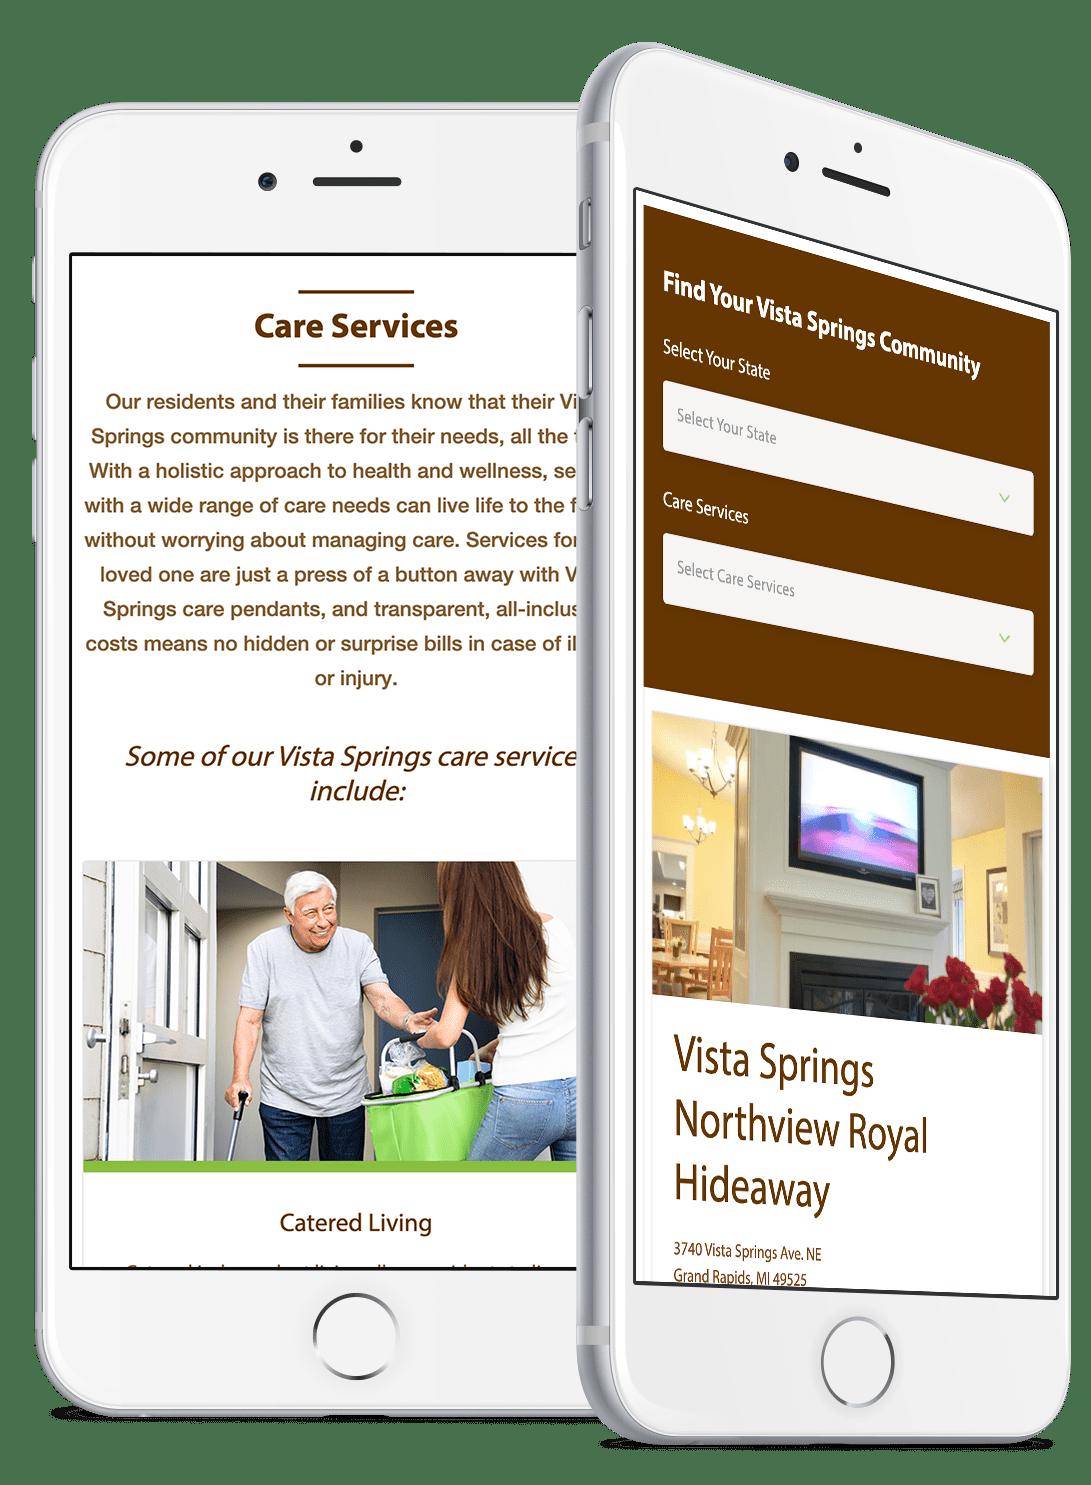 2020-mb-vista-springs-case-study-mobile